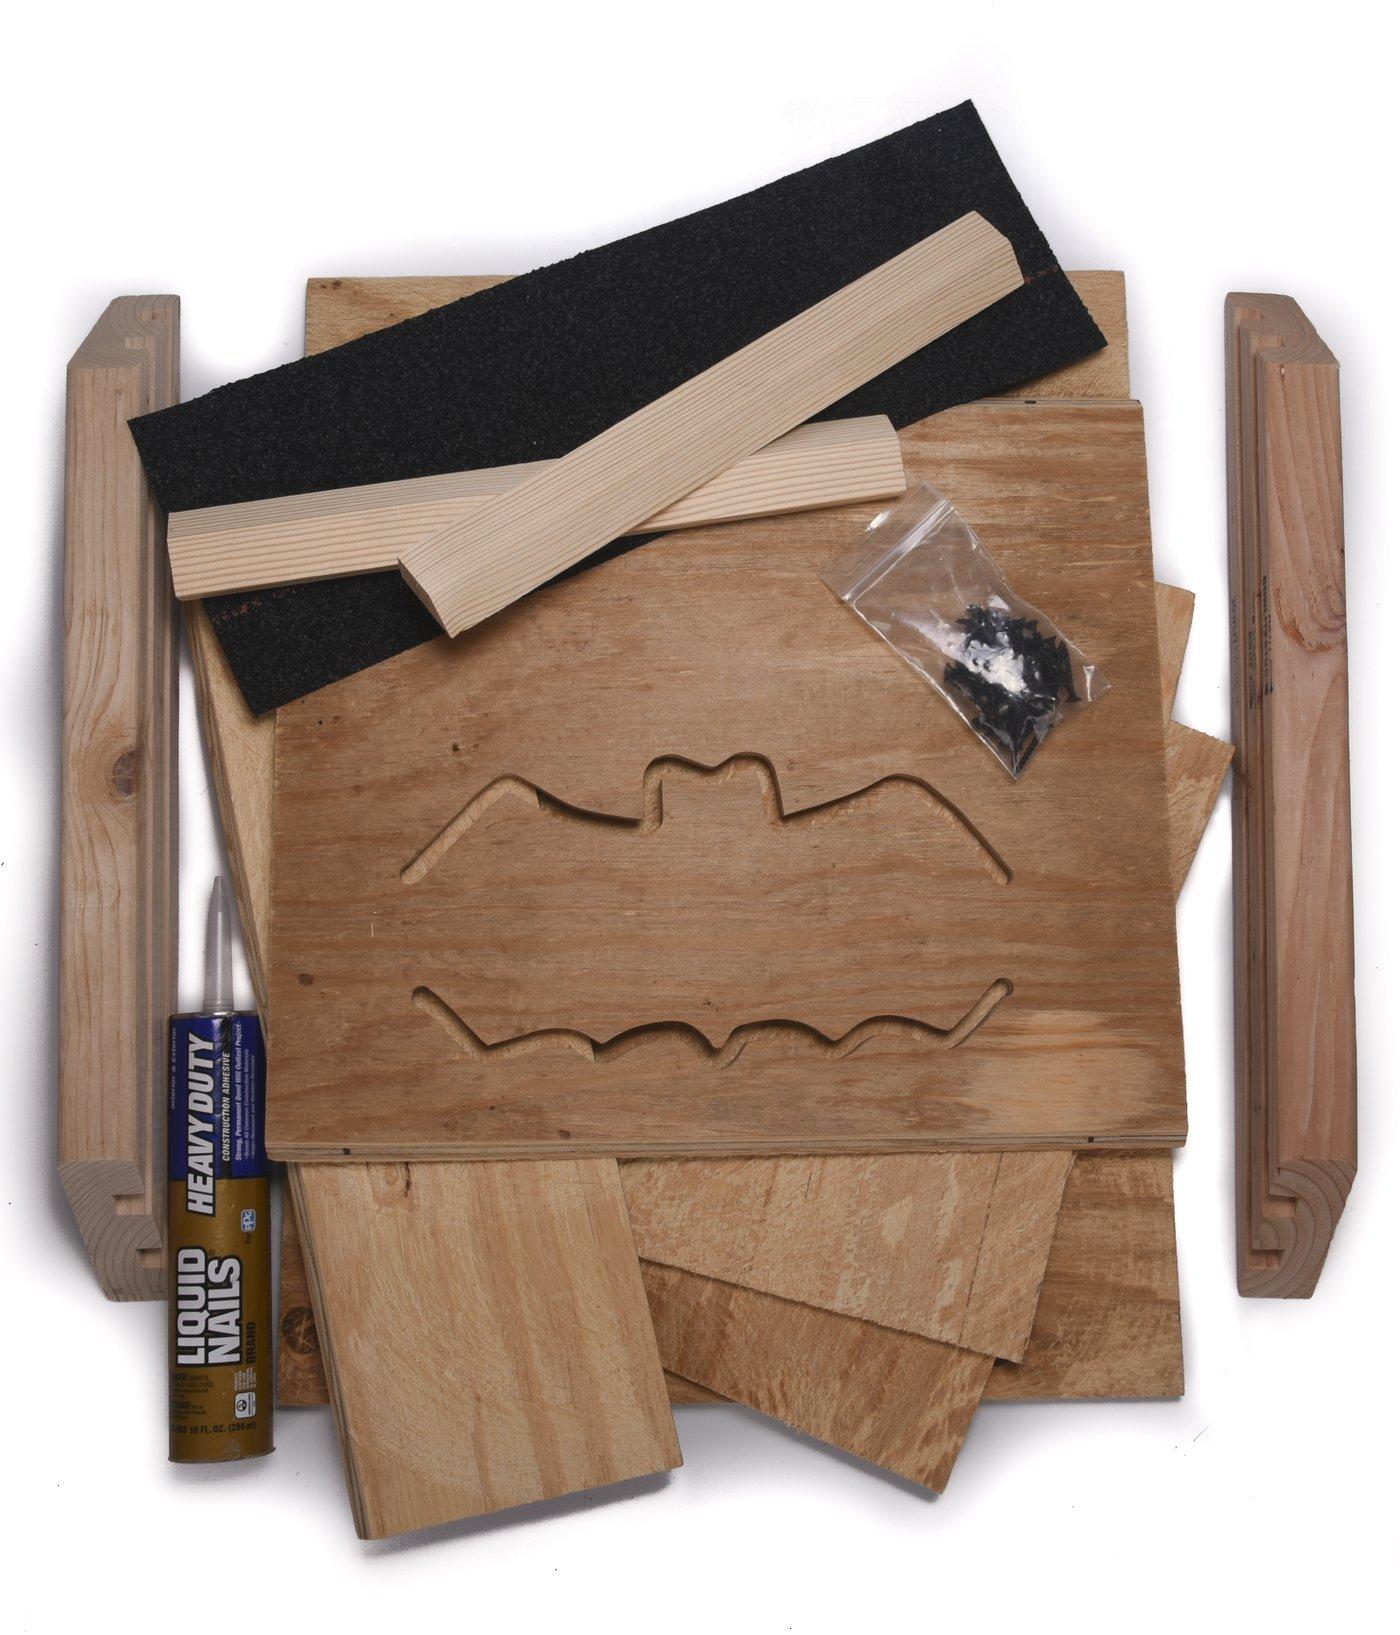 Bat Conservation and Management 3-Chamber Bat House Kit